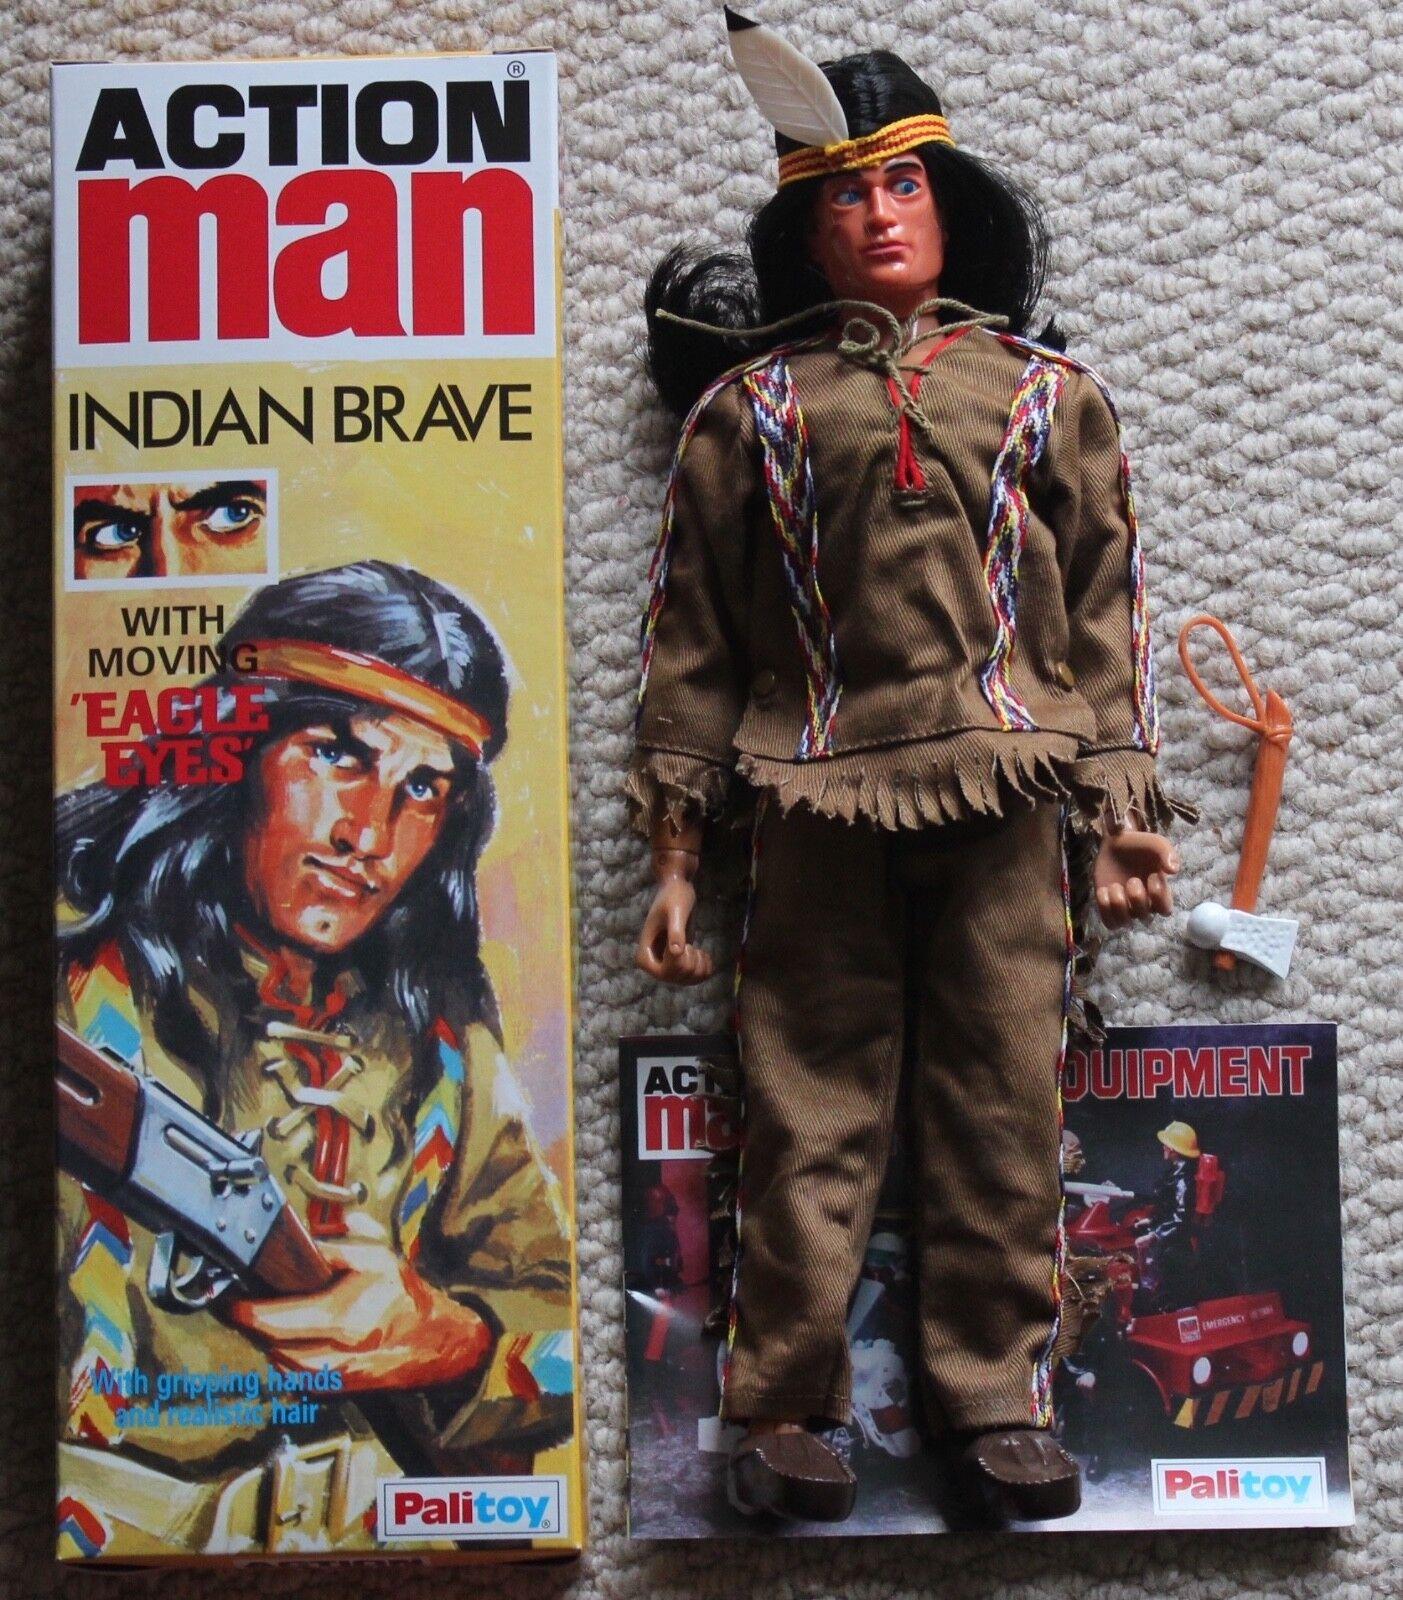 VINTAGE ACTION MAN 40th ANNIVERSARIO Eagle Eagle Eagle Eye Indiano avvincente Mani in Scatola 1a0f57